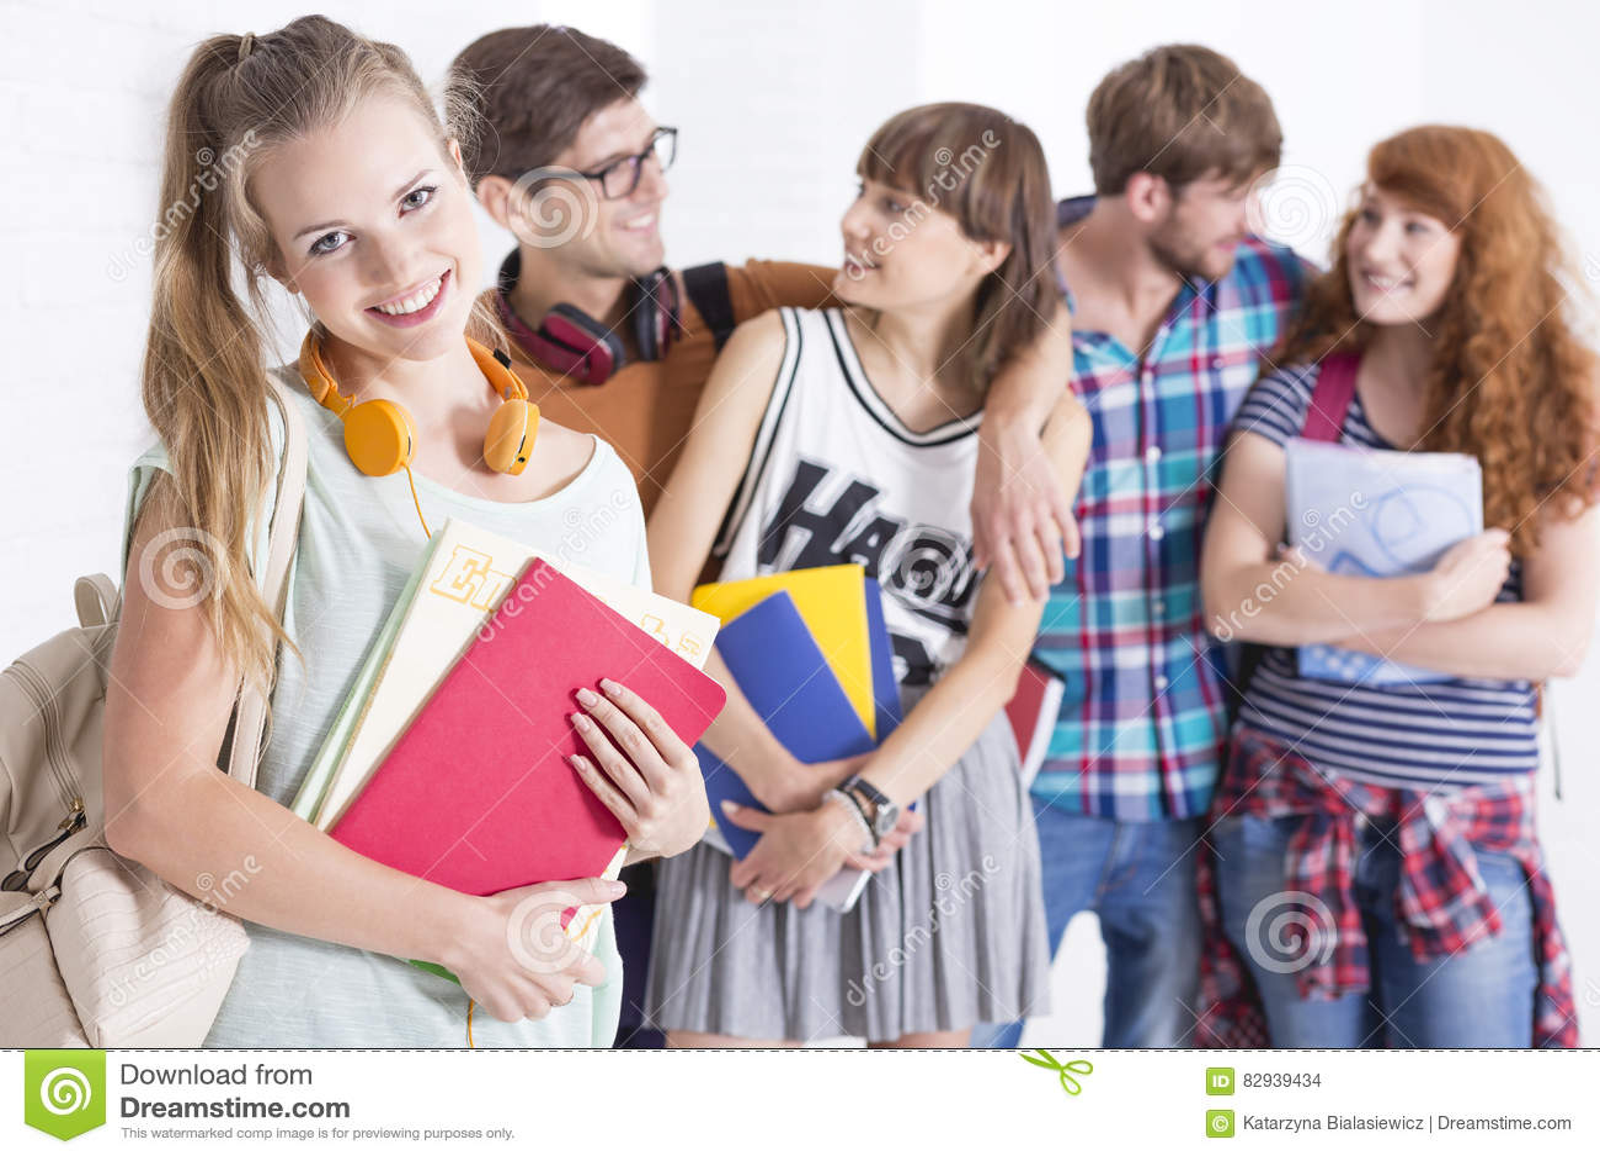 Girl prepared for classes